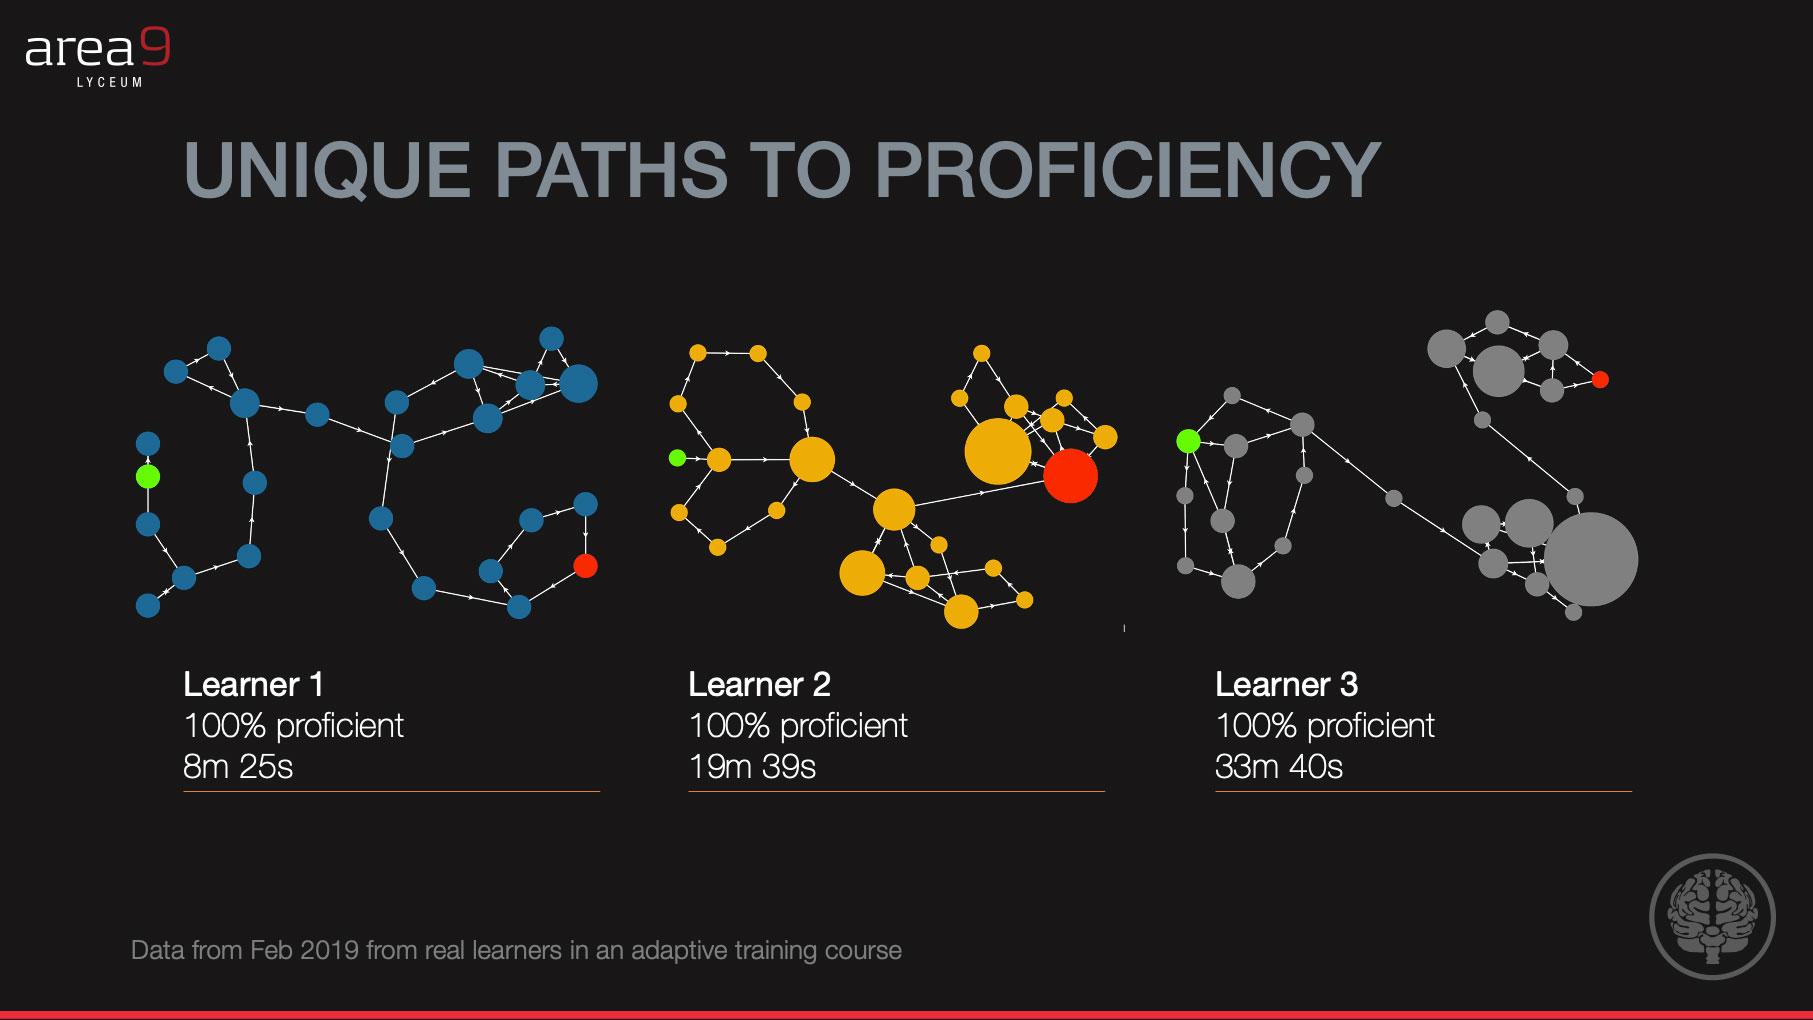 Unique Paths to Proficiency